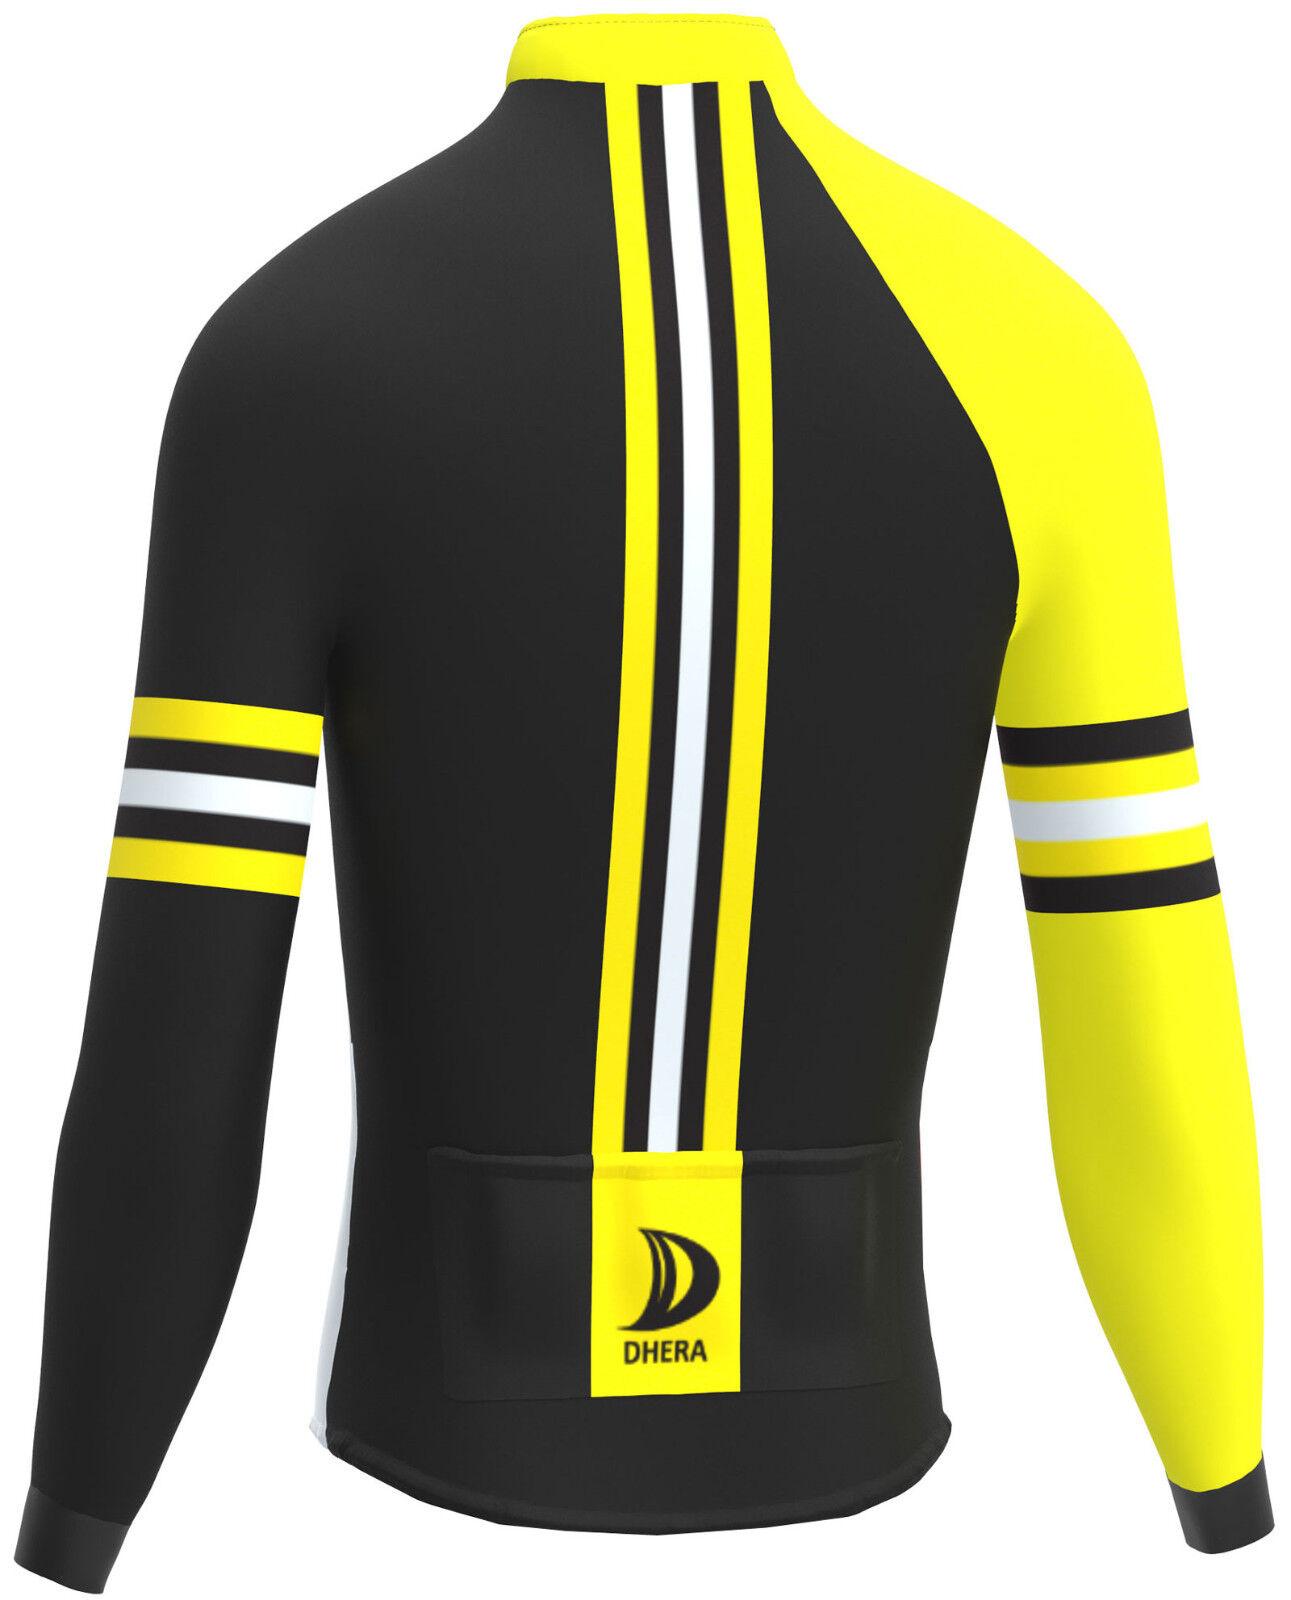 36c8d4e6be Invierno de manga larga de DHERA cremallera completa Top Jersey ciclismo  Jersey térmico de carreras